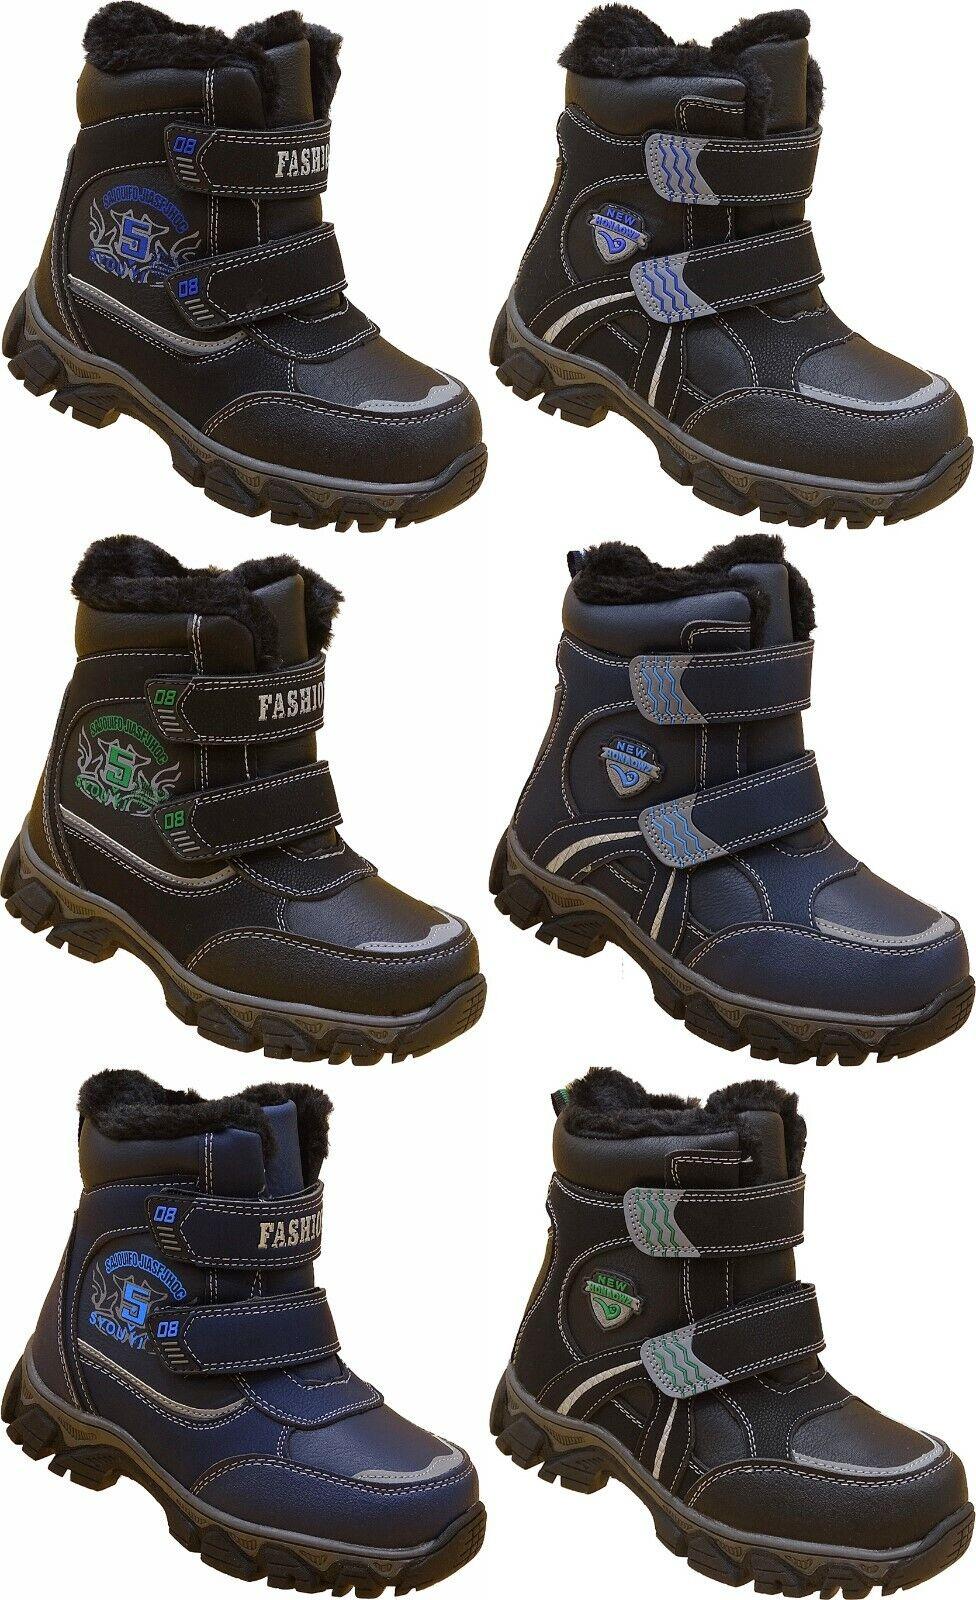 Jungen Schuhe Kinder Winter Stiefel Boots warm gefüttert Gr.27 - 38 Nr.808